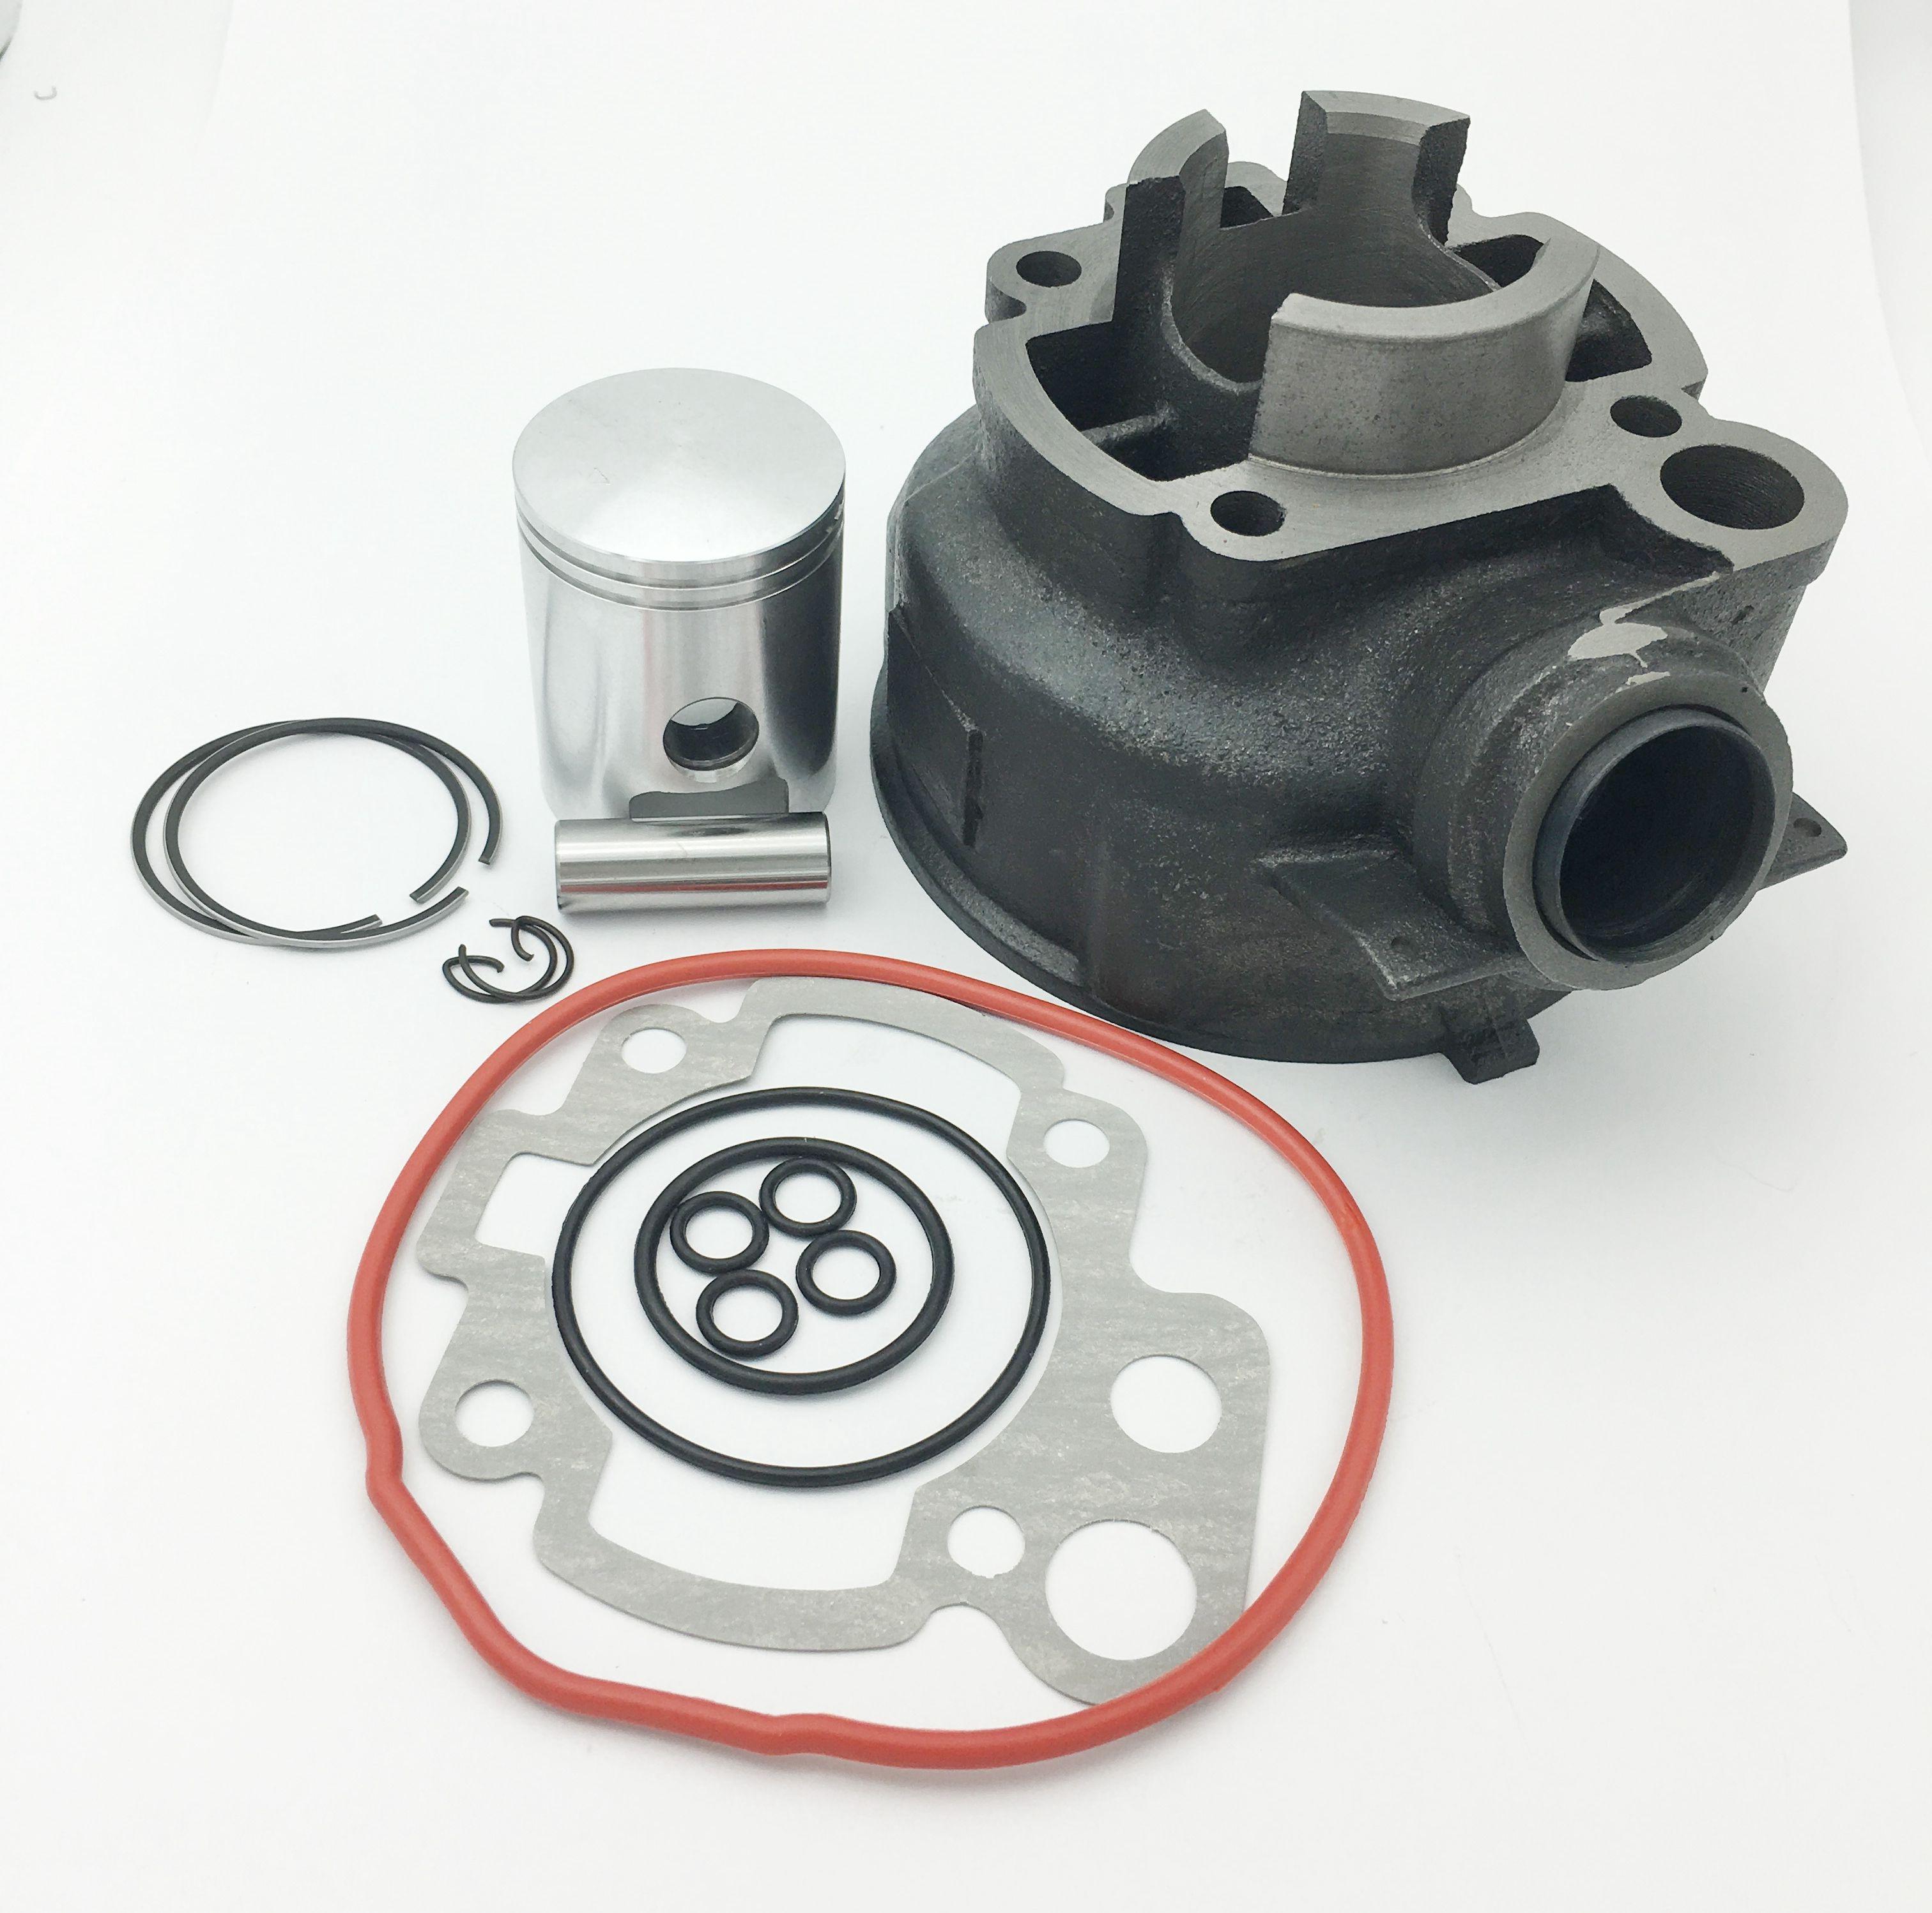 Am6 50cc Cylinderkit